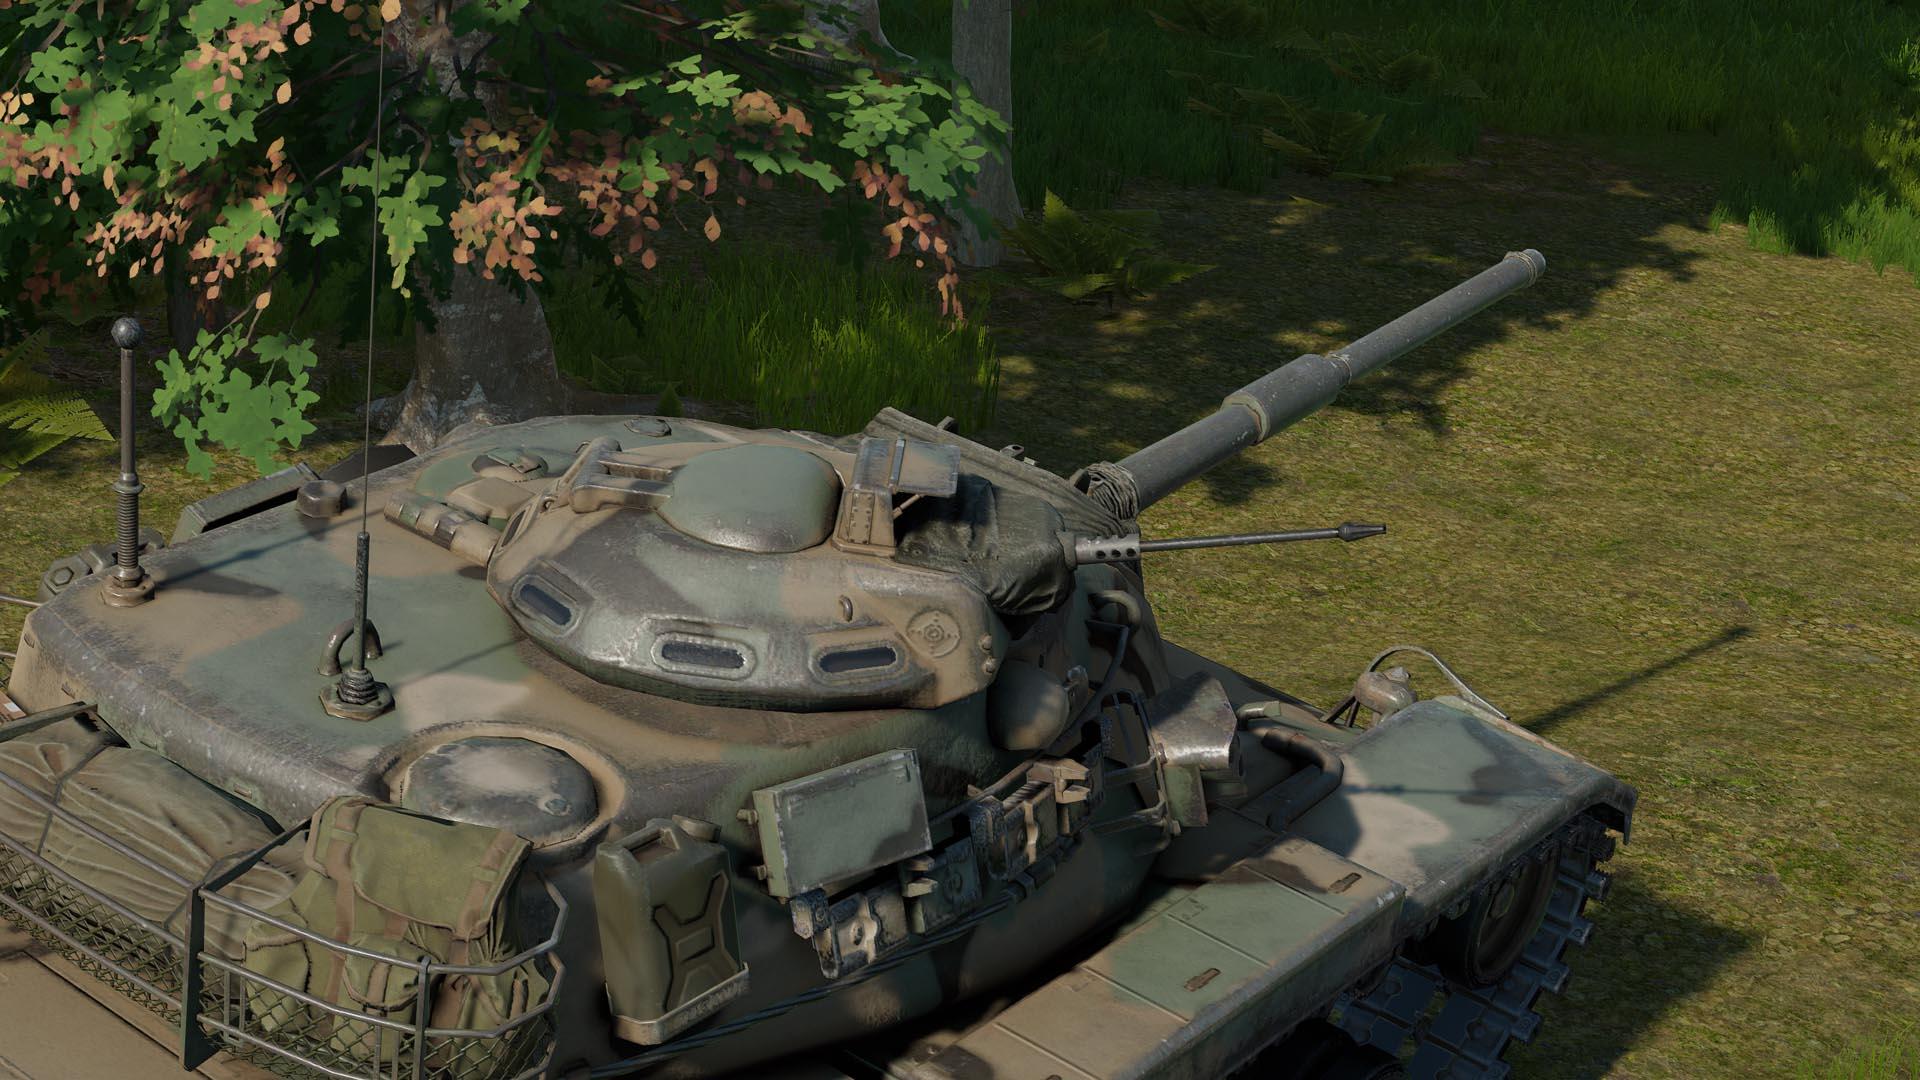 M60A3 TTS with M85 cupola gun